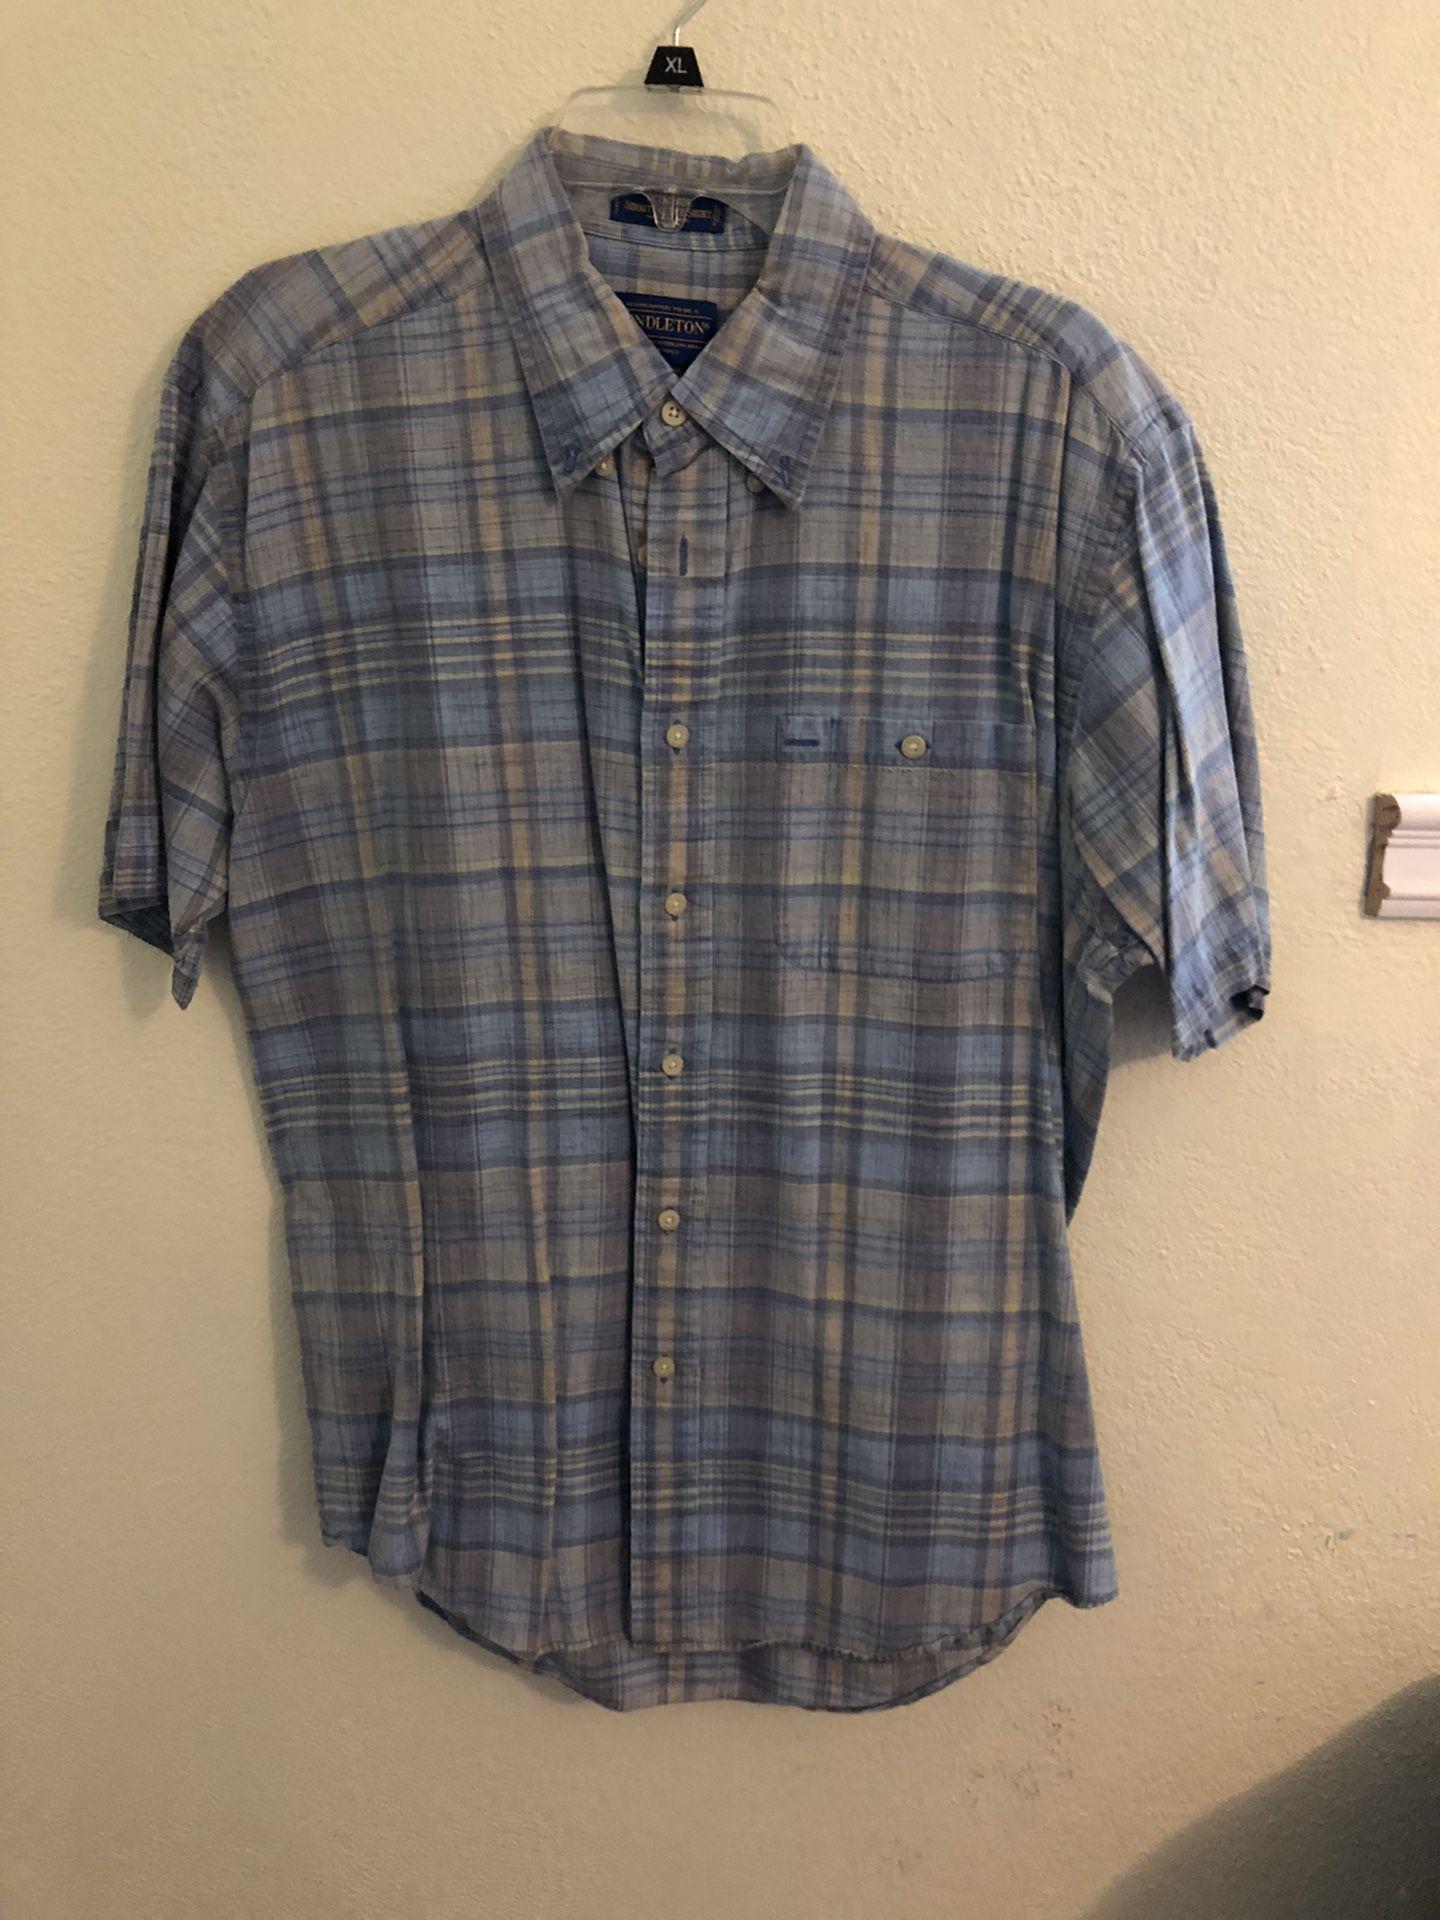 Pendleton Board Shirt // Button Up // Pocket T Shirt // Plaid // Dress // Sunday // Relaxed // Church // Work // Skateboards // Baby Blue // Vintage